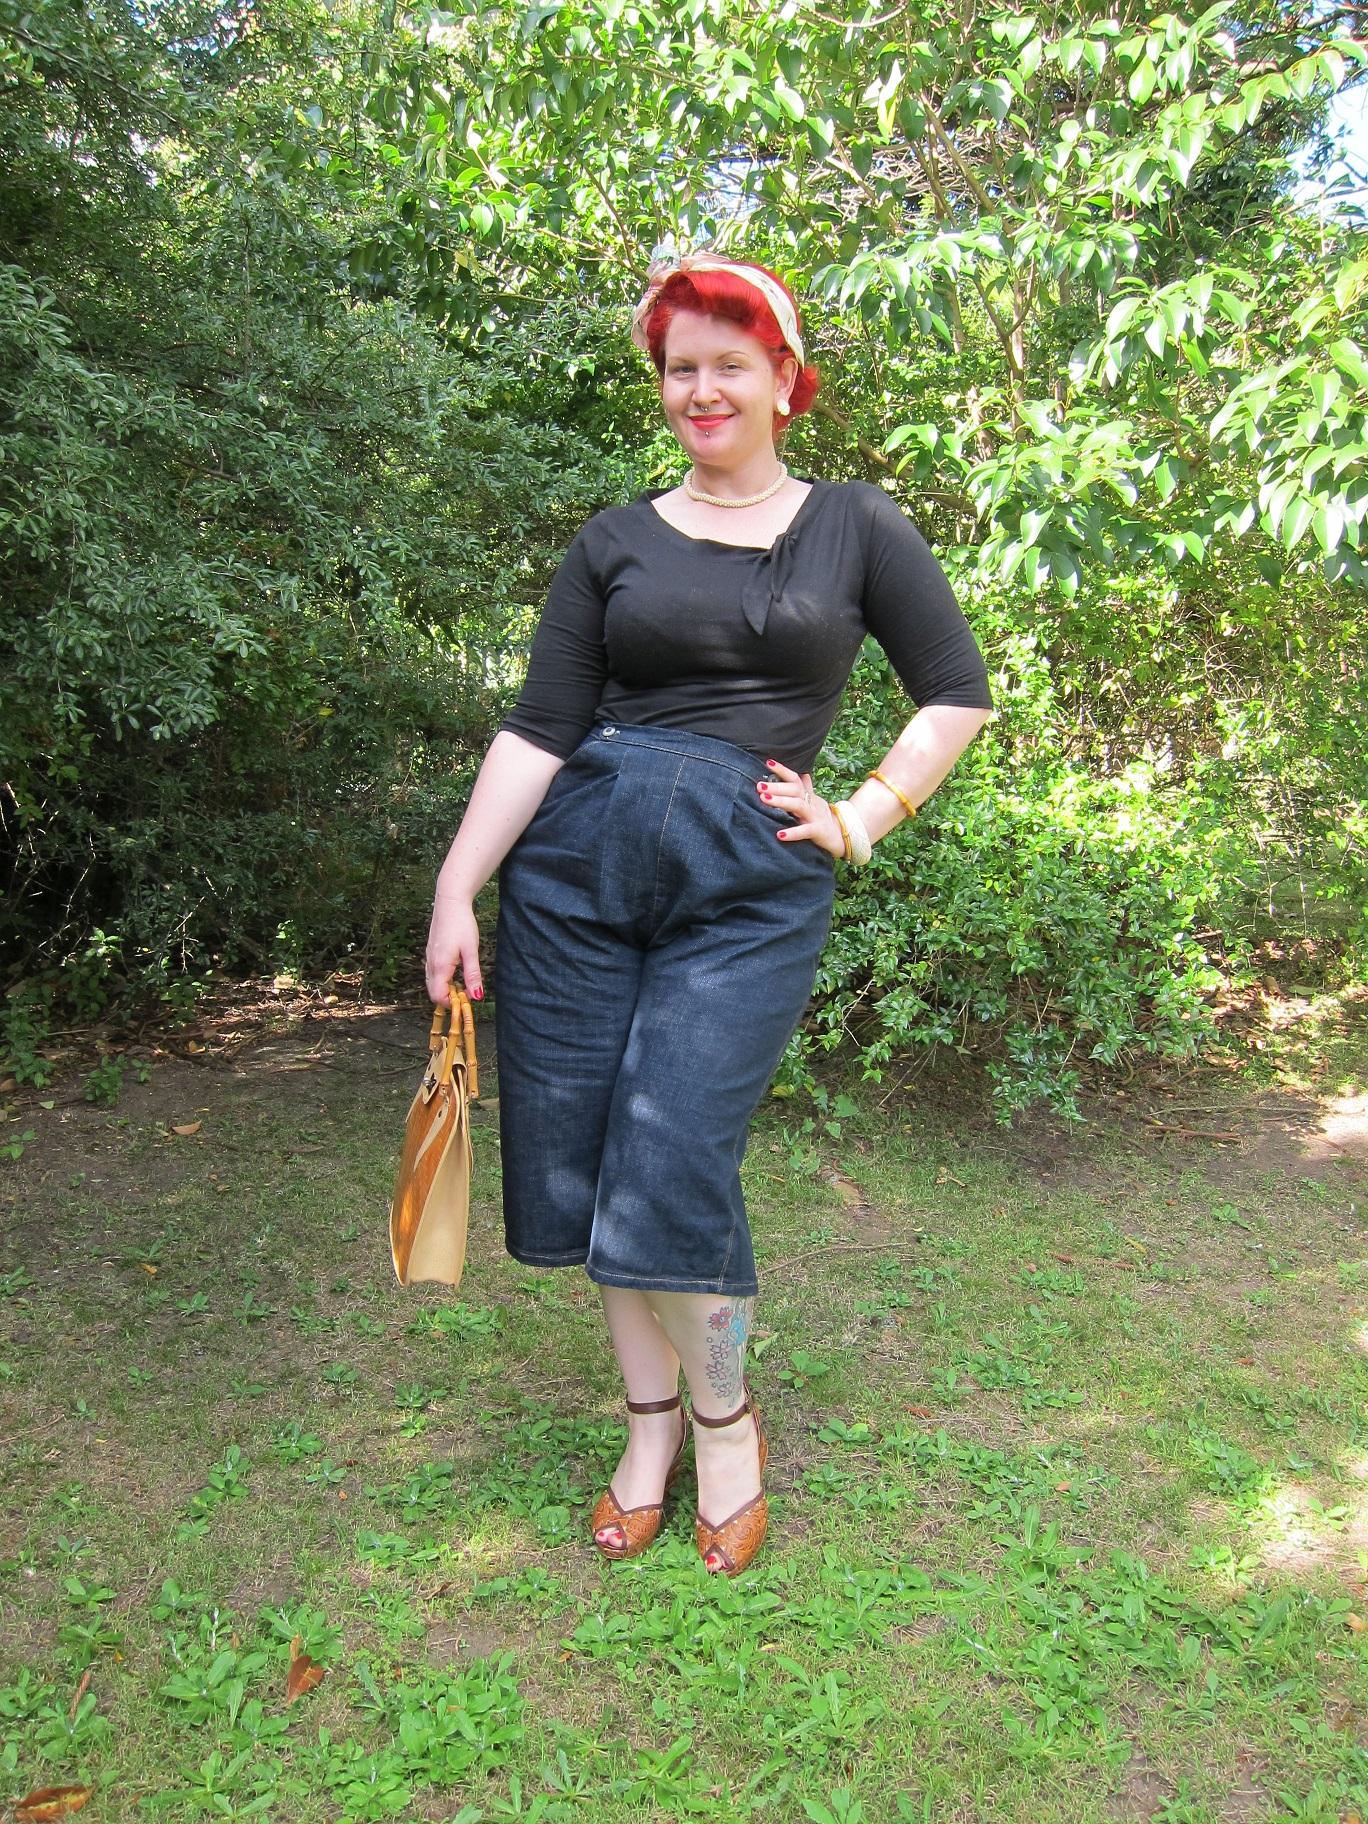 lesbian femme 1950s vintage clamdiggers capri pants denim miss l fire cane handbag tijuana plus size xl PUG